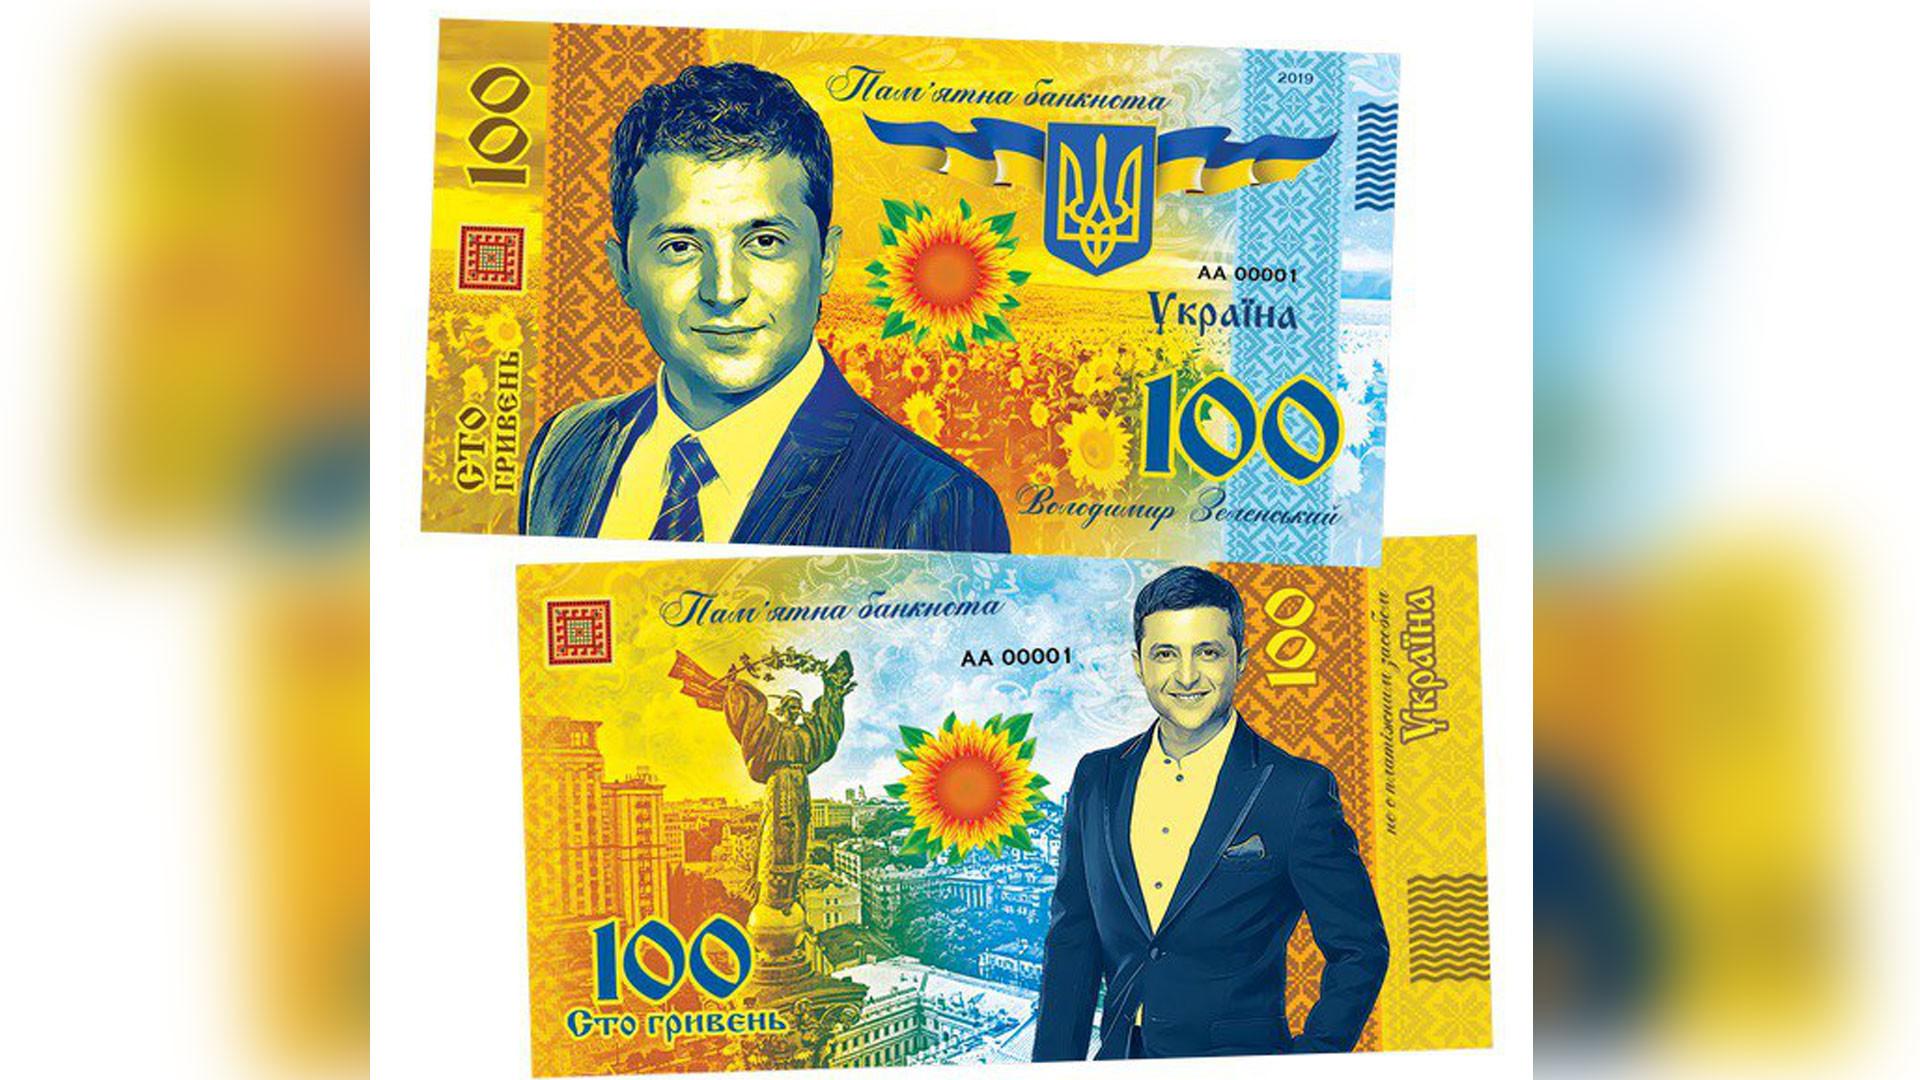 "<p>Фото © <a href=""https://www.ebay.com/itm/Ukraine-UAH-100-hryvnia-Volodymyr-Zelensky-6th-President-of-Ukraine-/264385196575"" target=""_self"">ebay.com</a></p>"